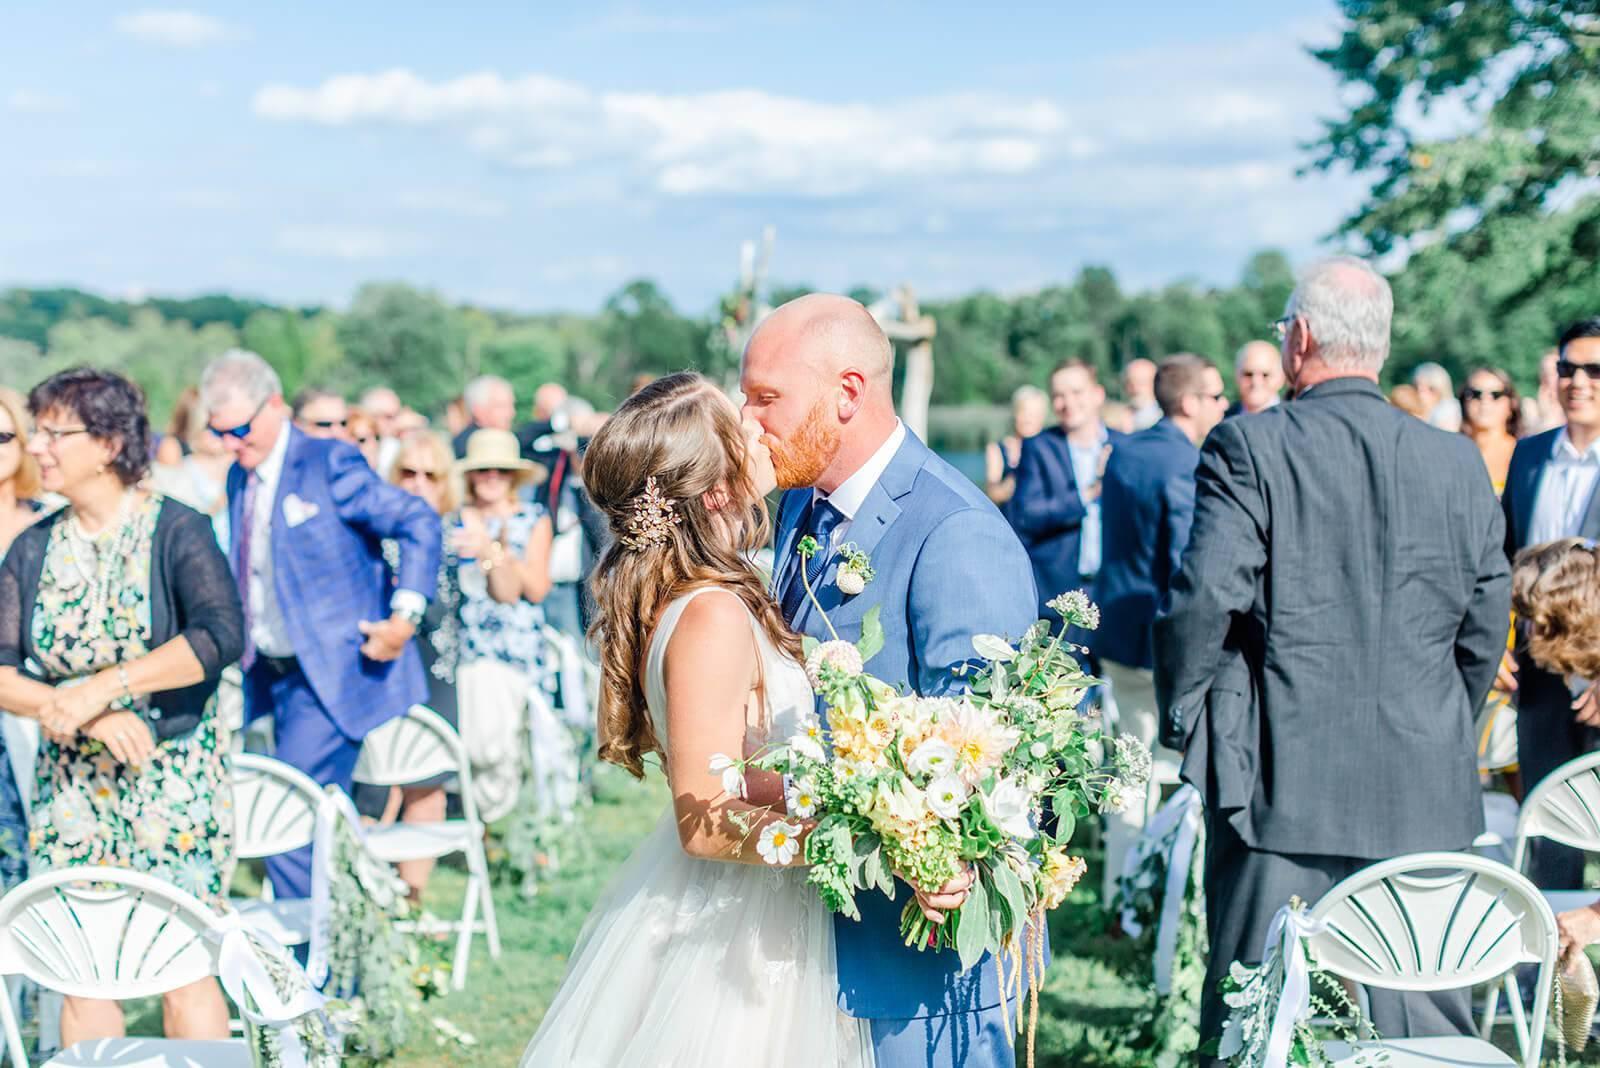 Wedding Recap: The Light and Airy Francis Beach Wedding